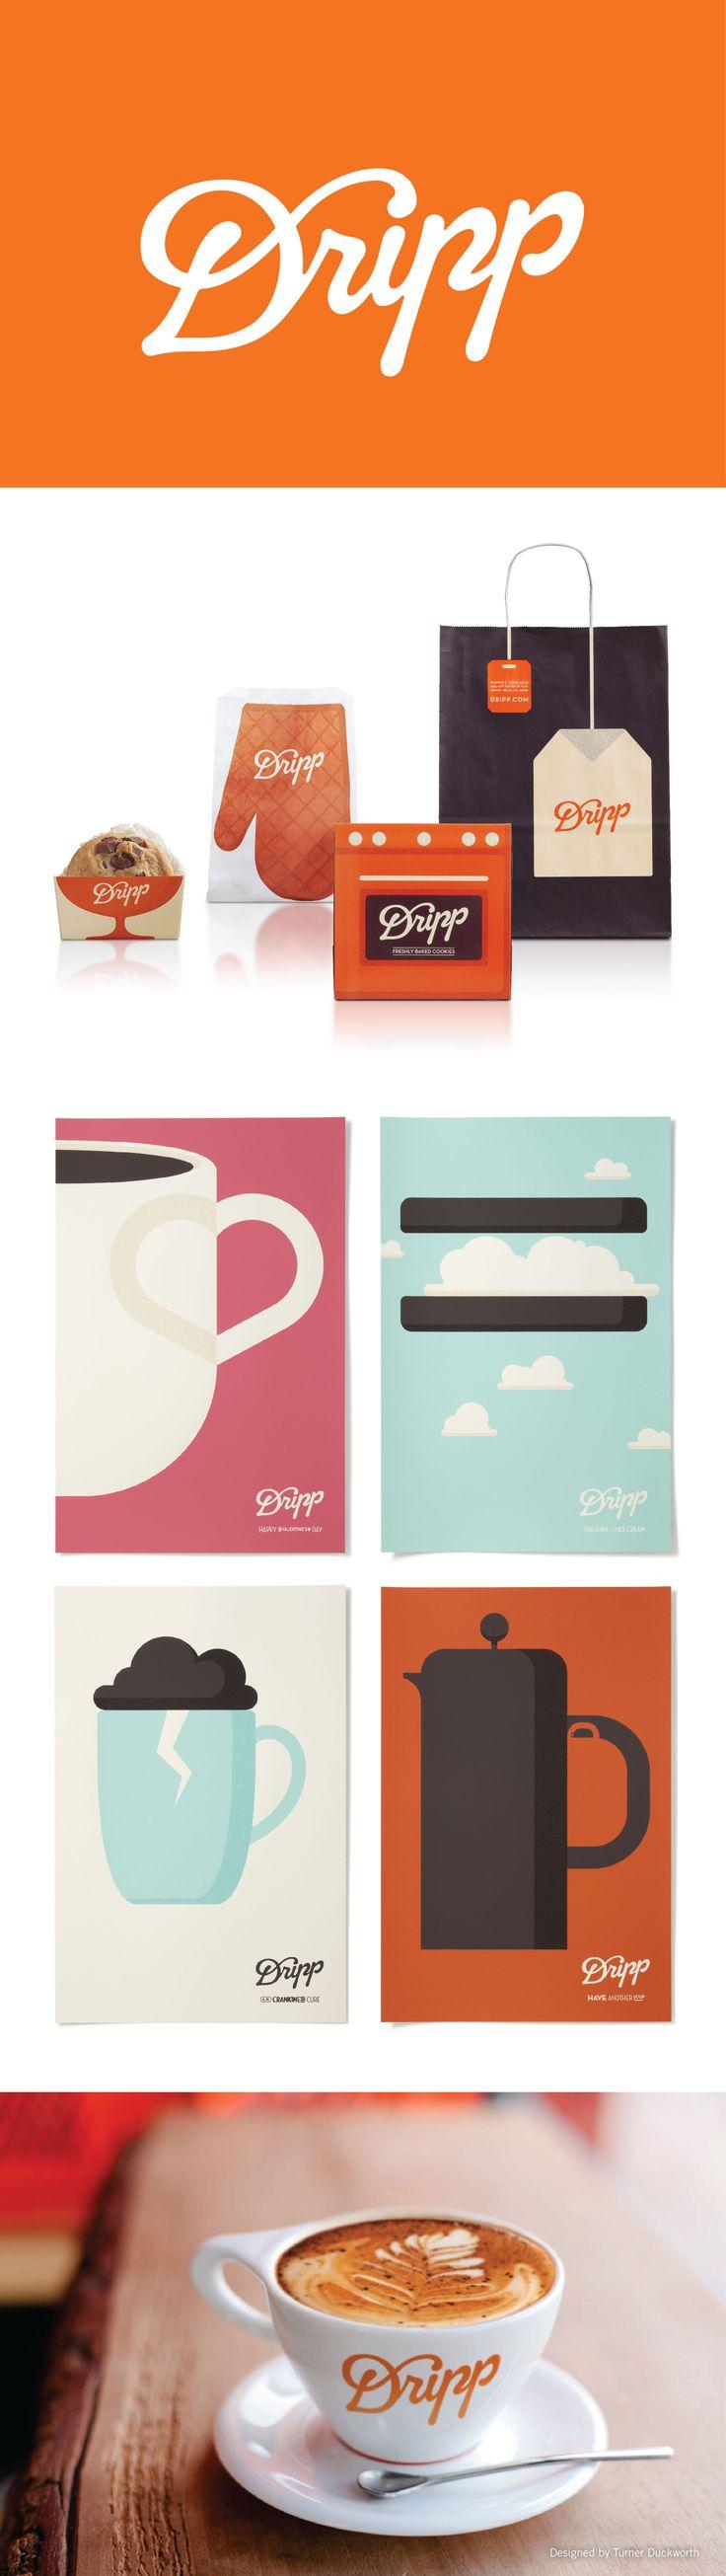 Dripp visual identity. Designed by Turner Duckworth.